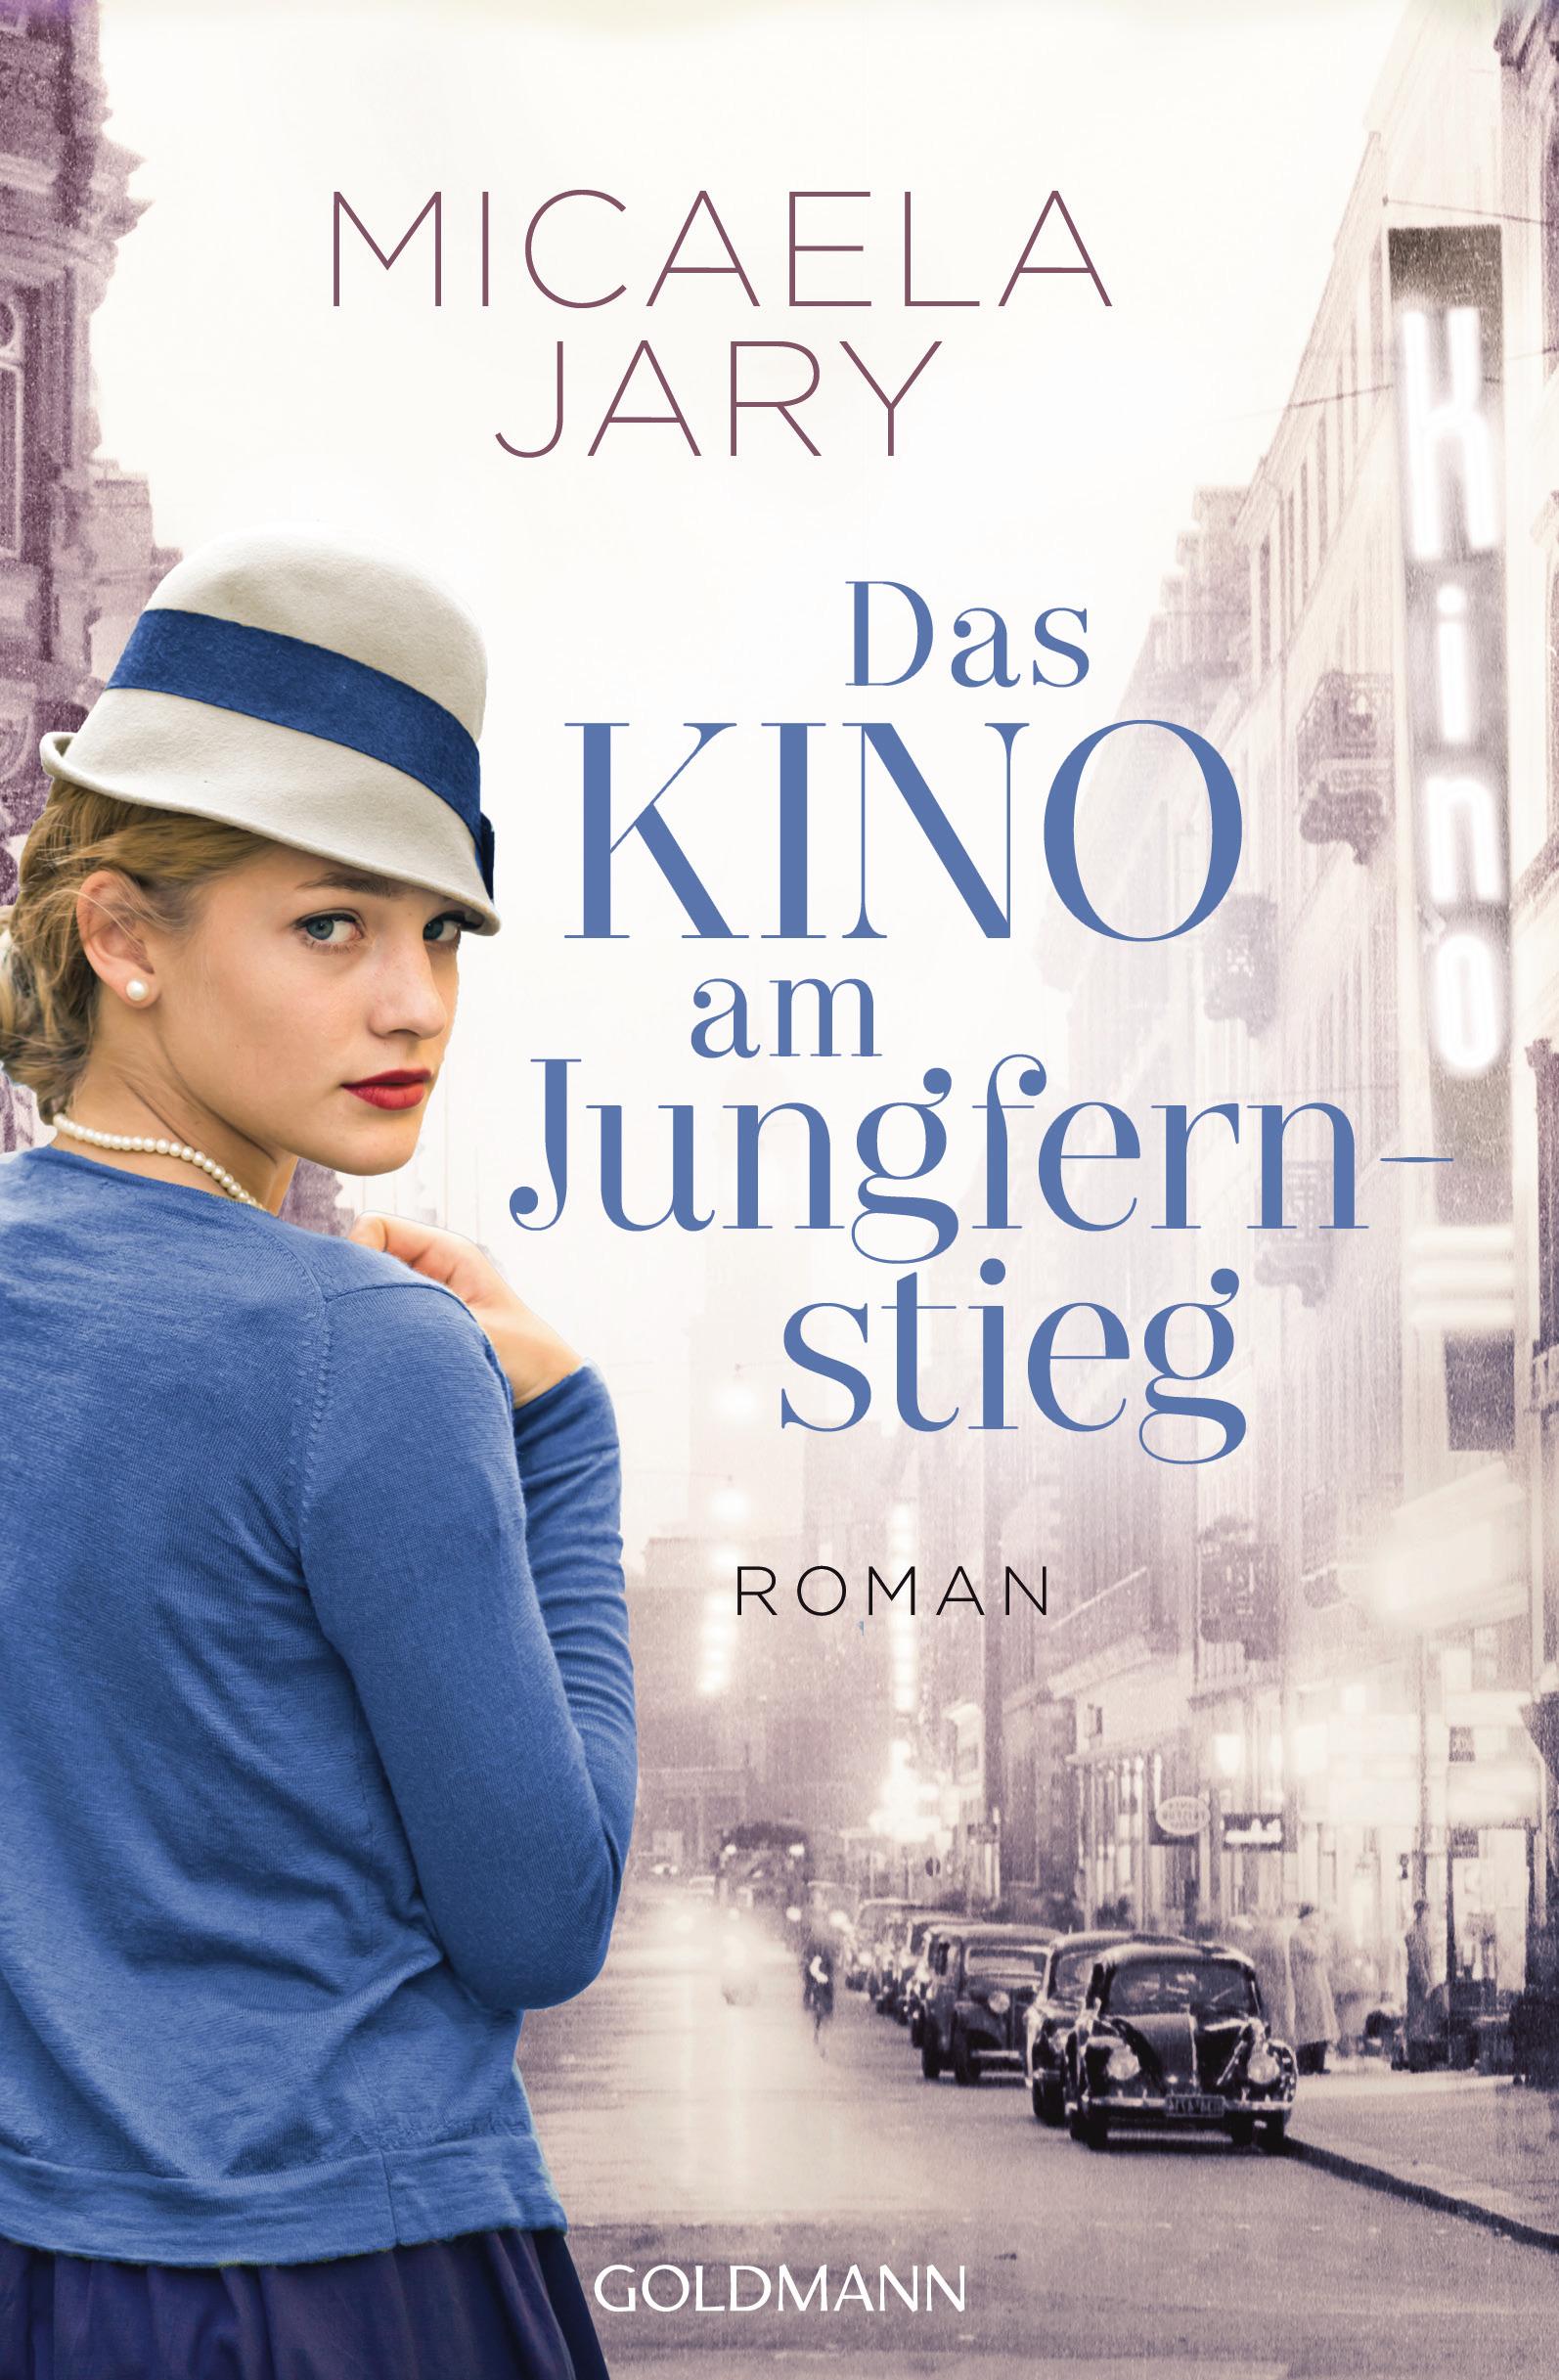 Die große Kino-Saga von Bestseller-Autorin Micaela Jary